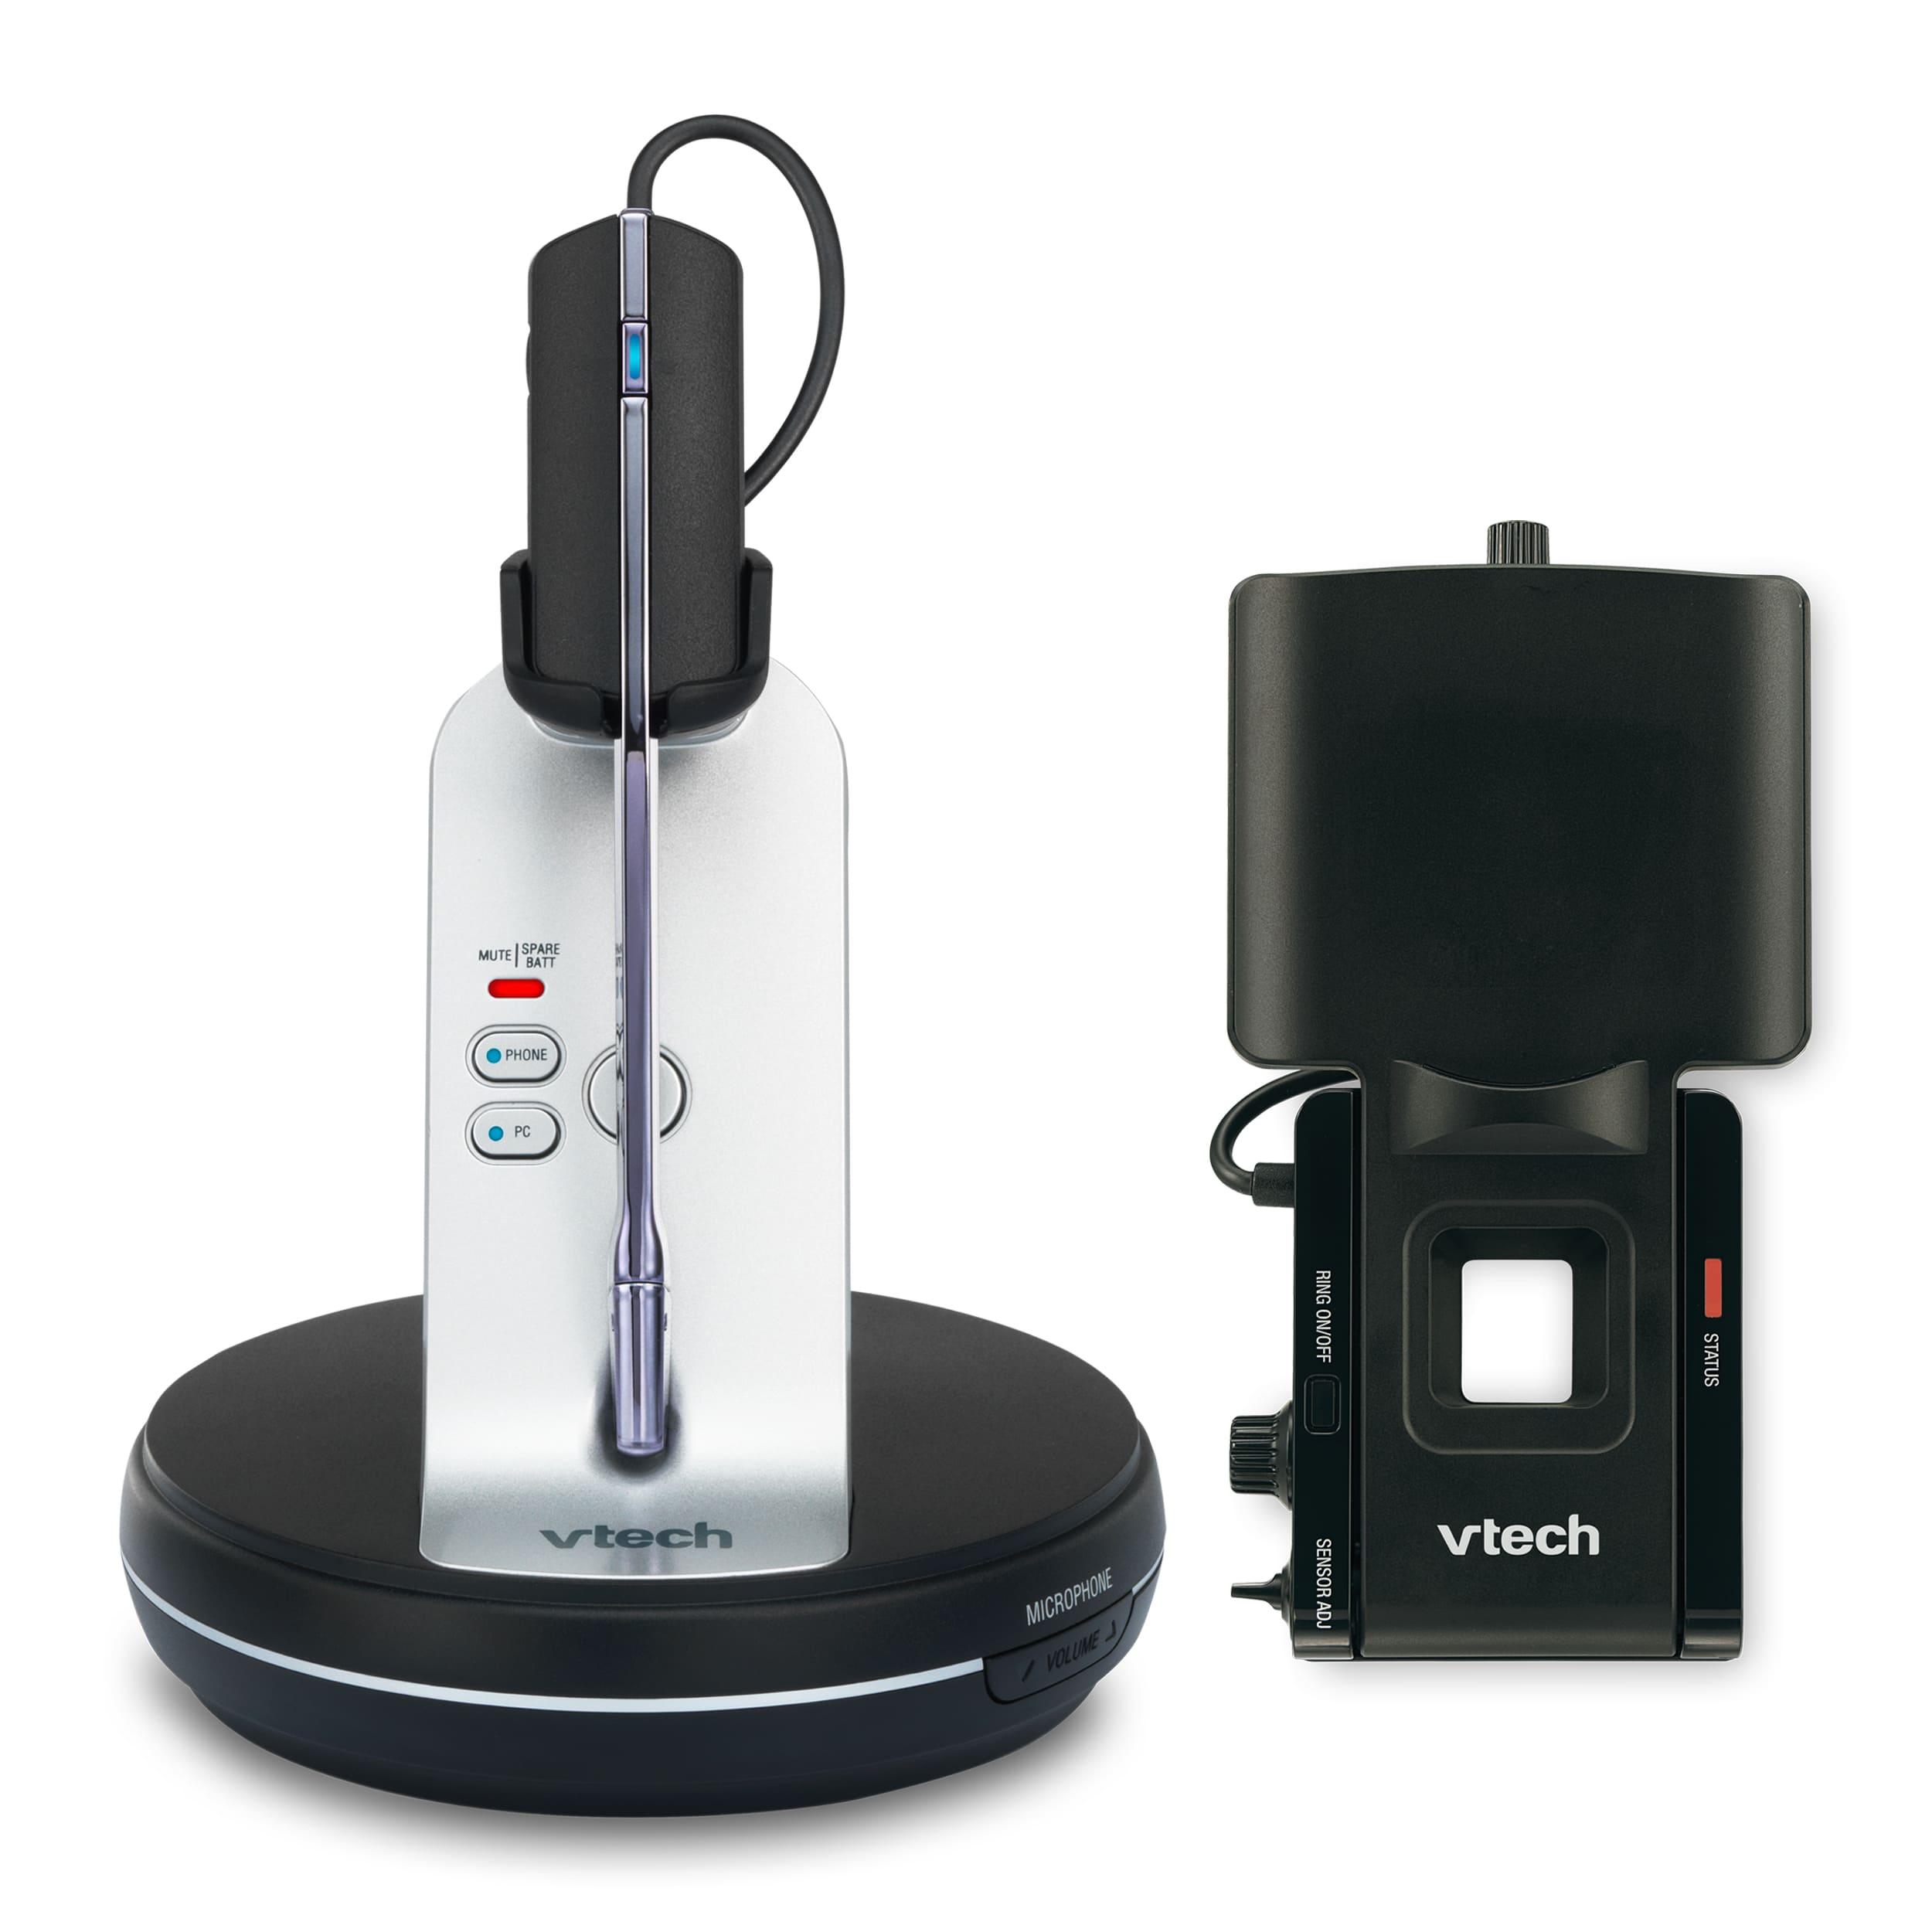 VH6211